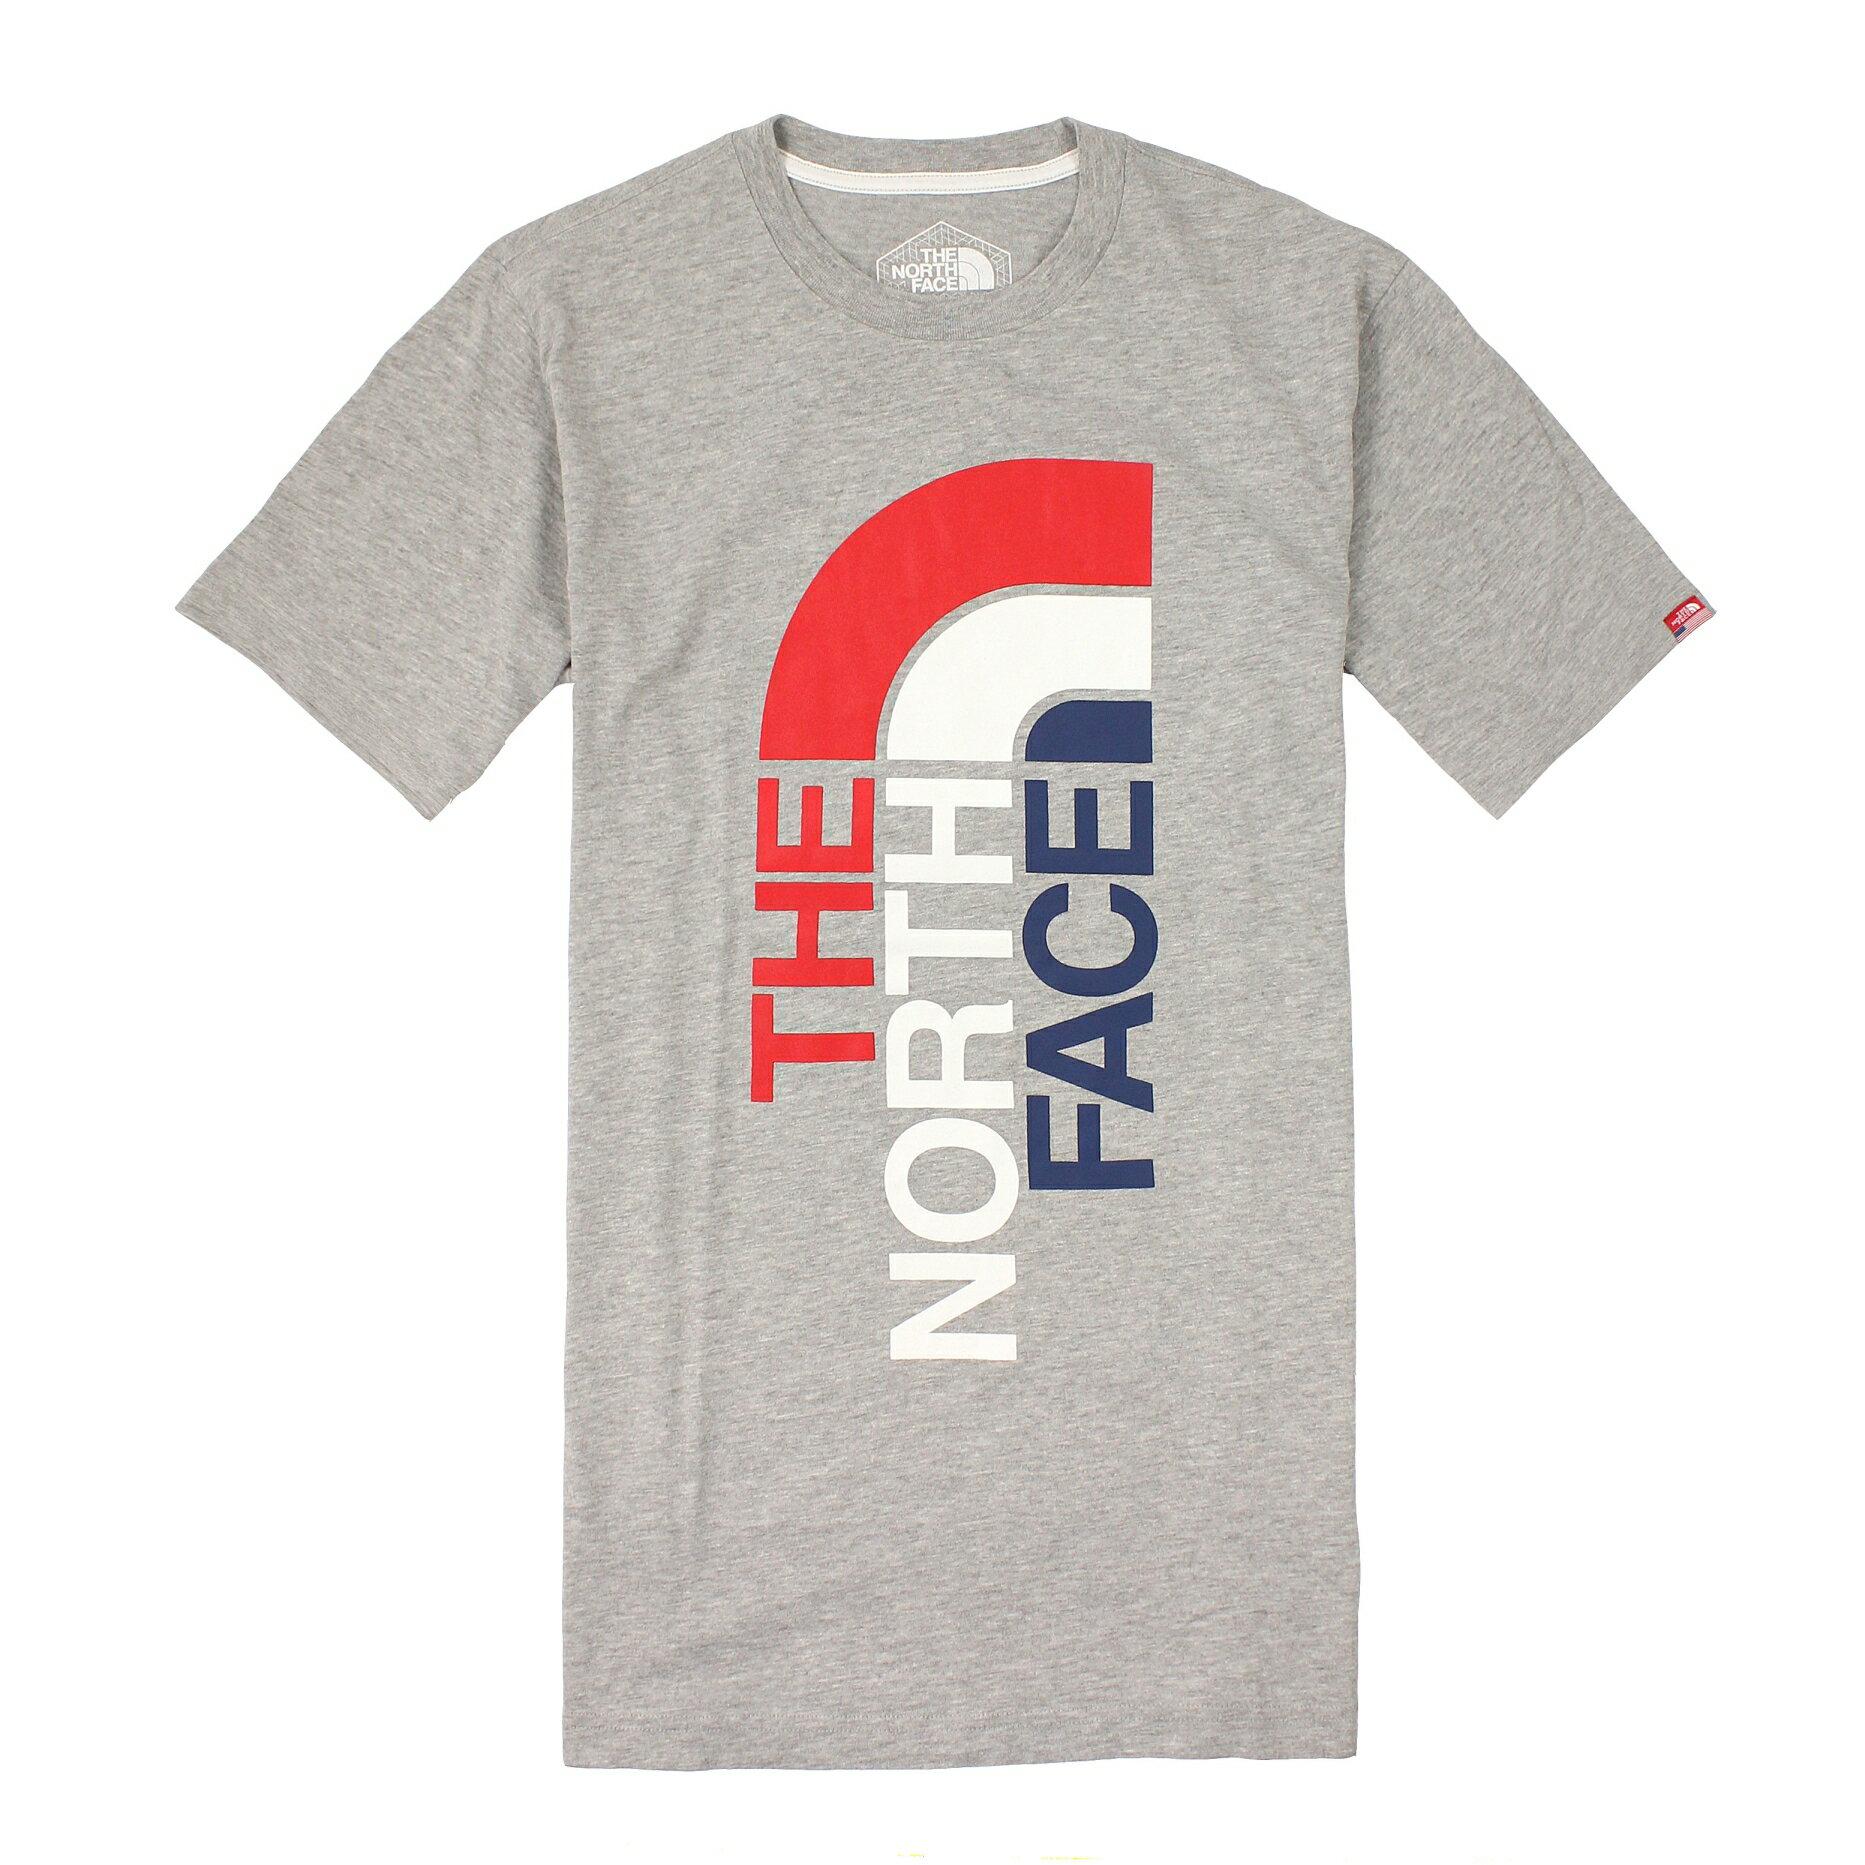 美國百分百【全新真品】The North Face T恤 TNF 短袖 上衣 T-shirt 北臉 灰 Logo 國旗 男 S號